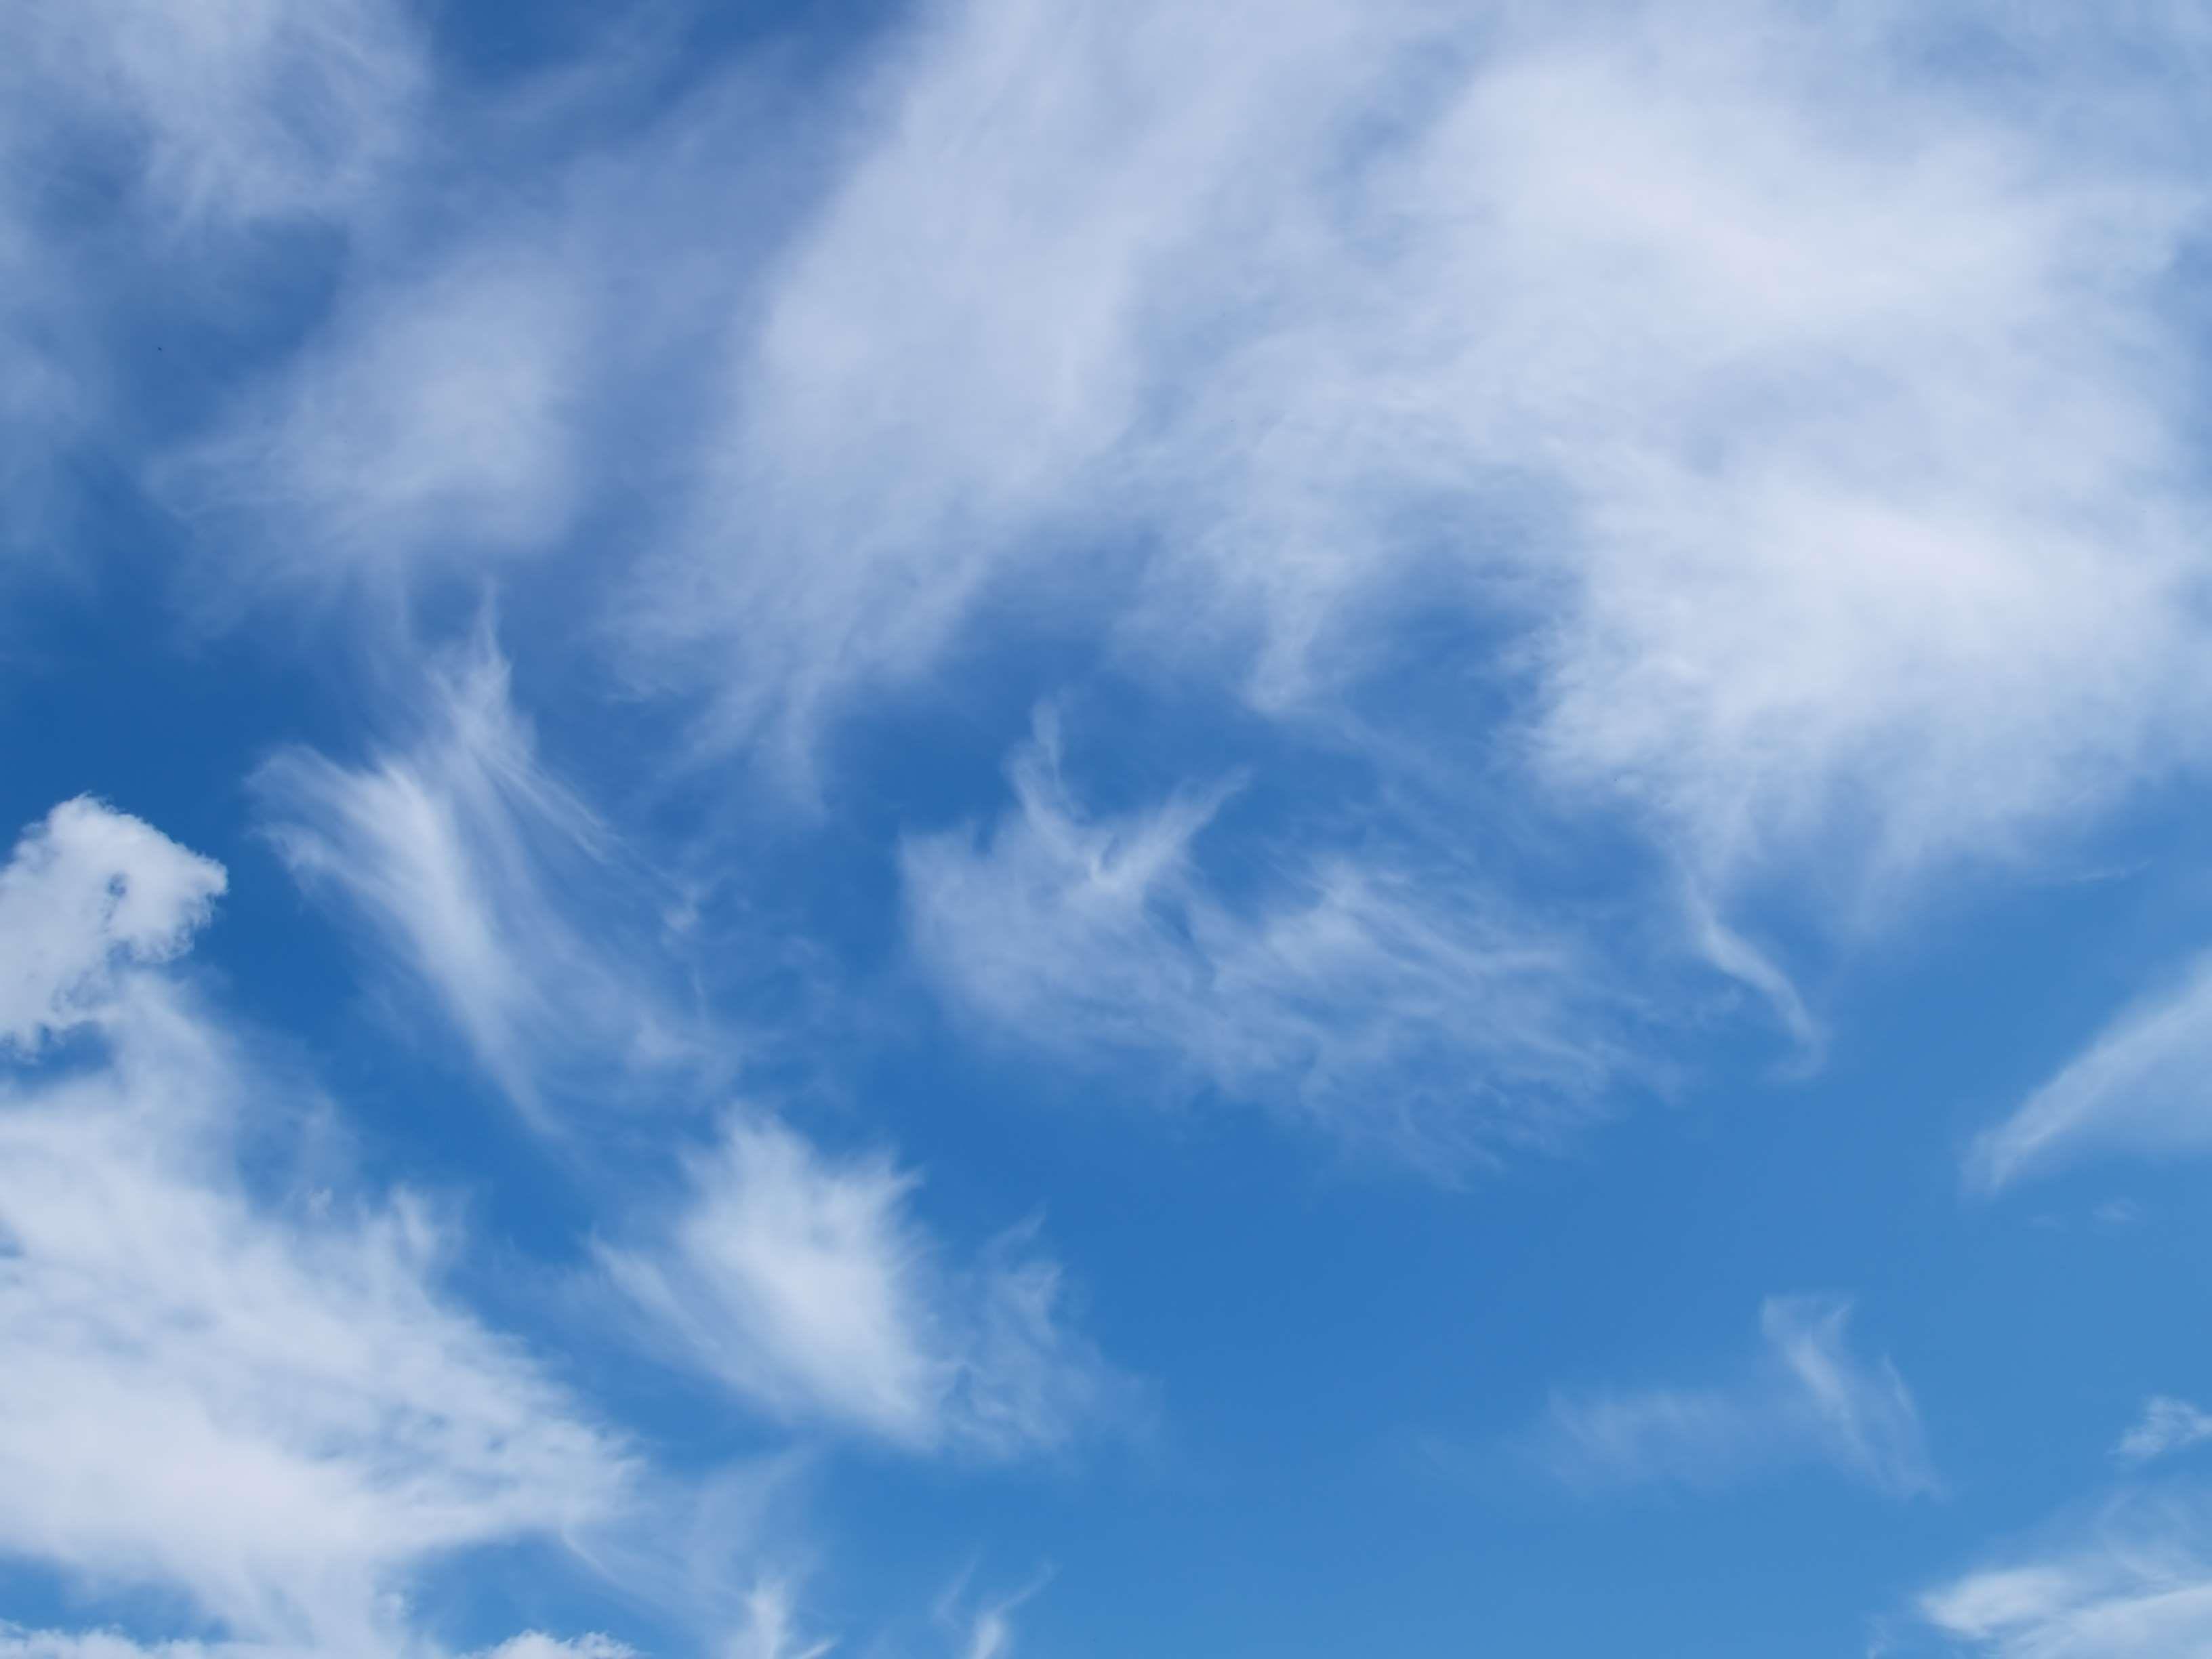 Blue Aesthetic Cloud Wallpapers Top Free Blue Aesthetic Cloud